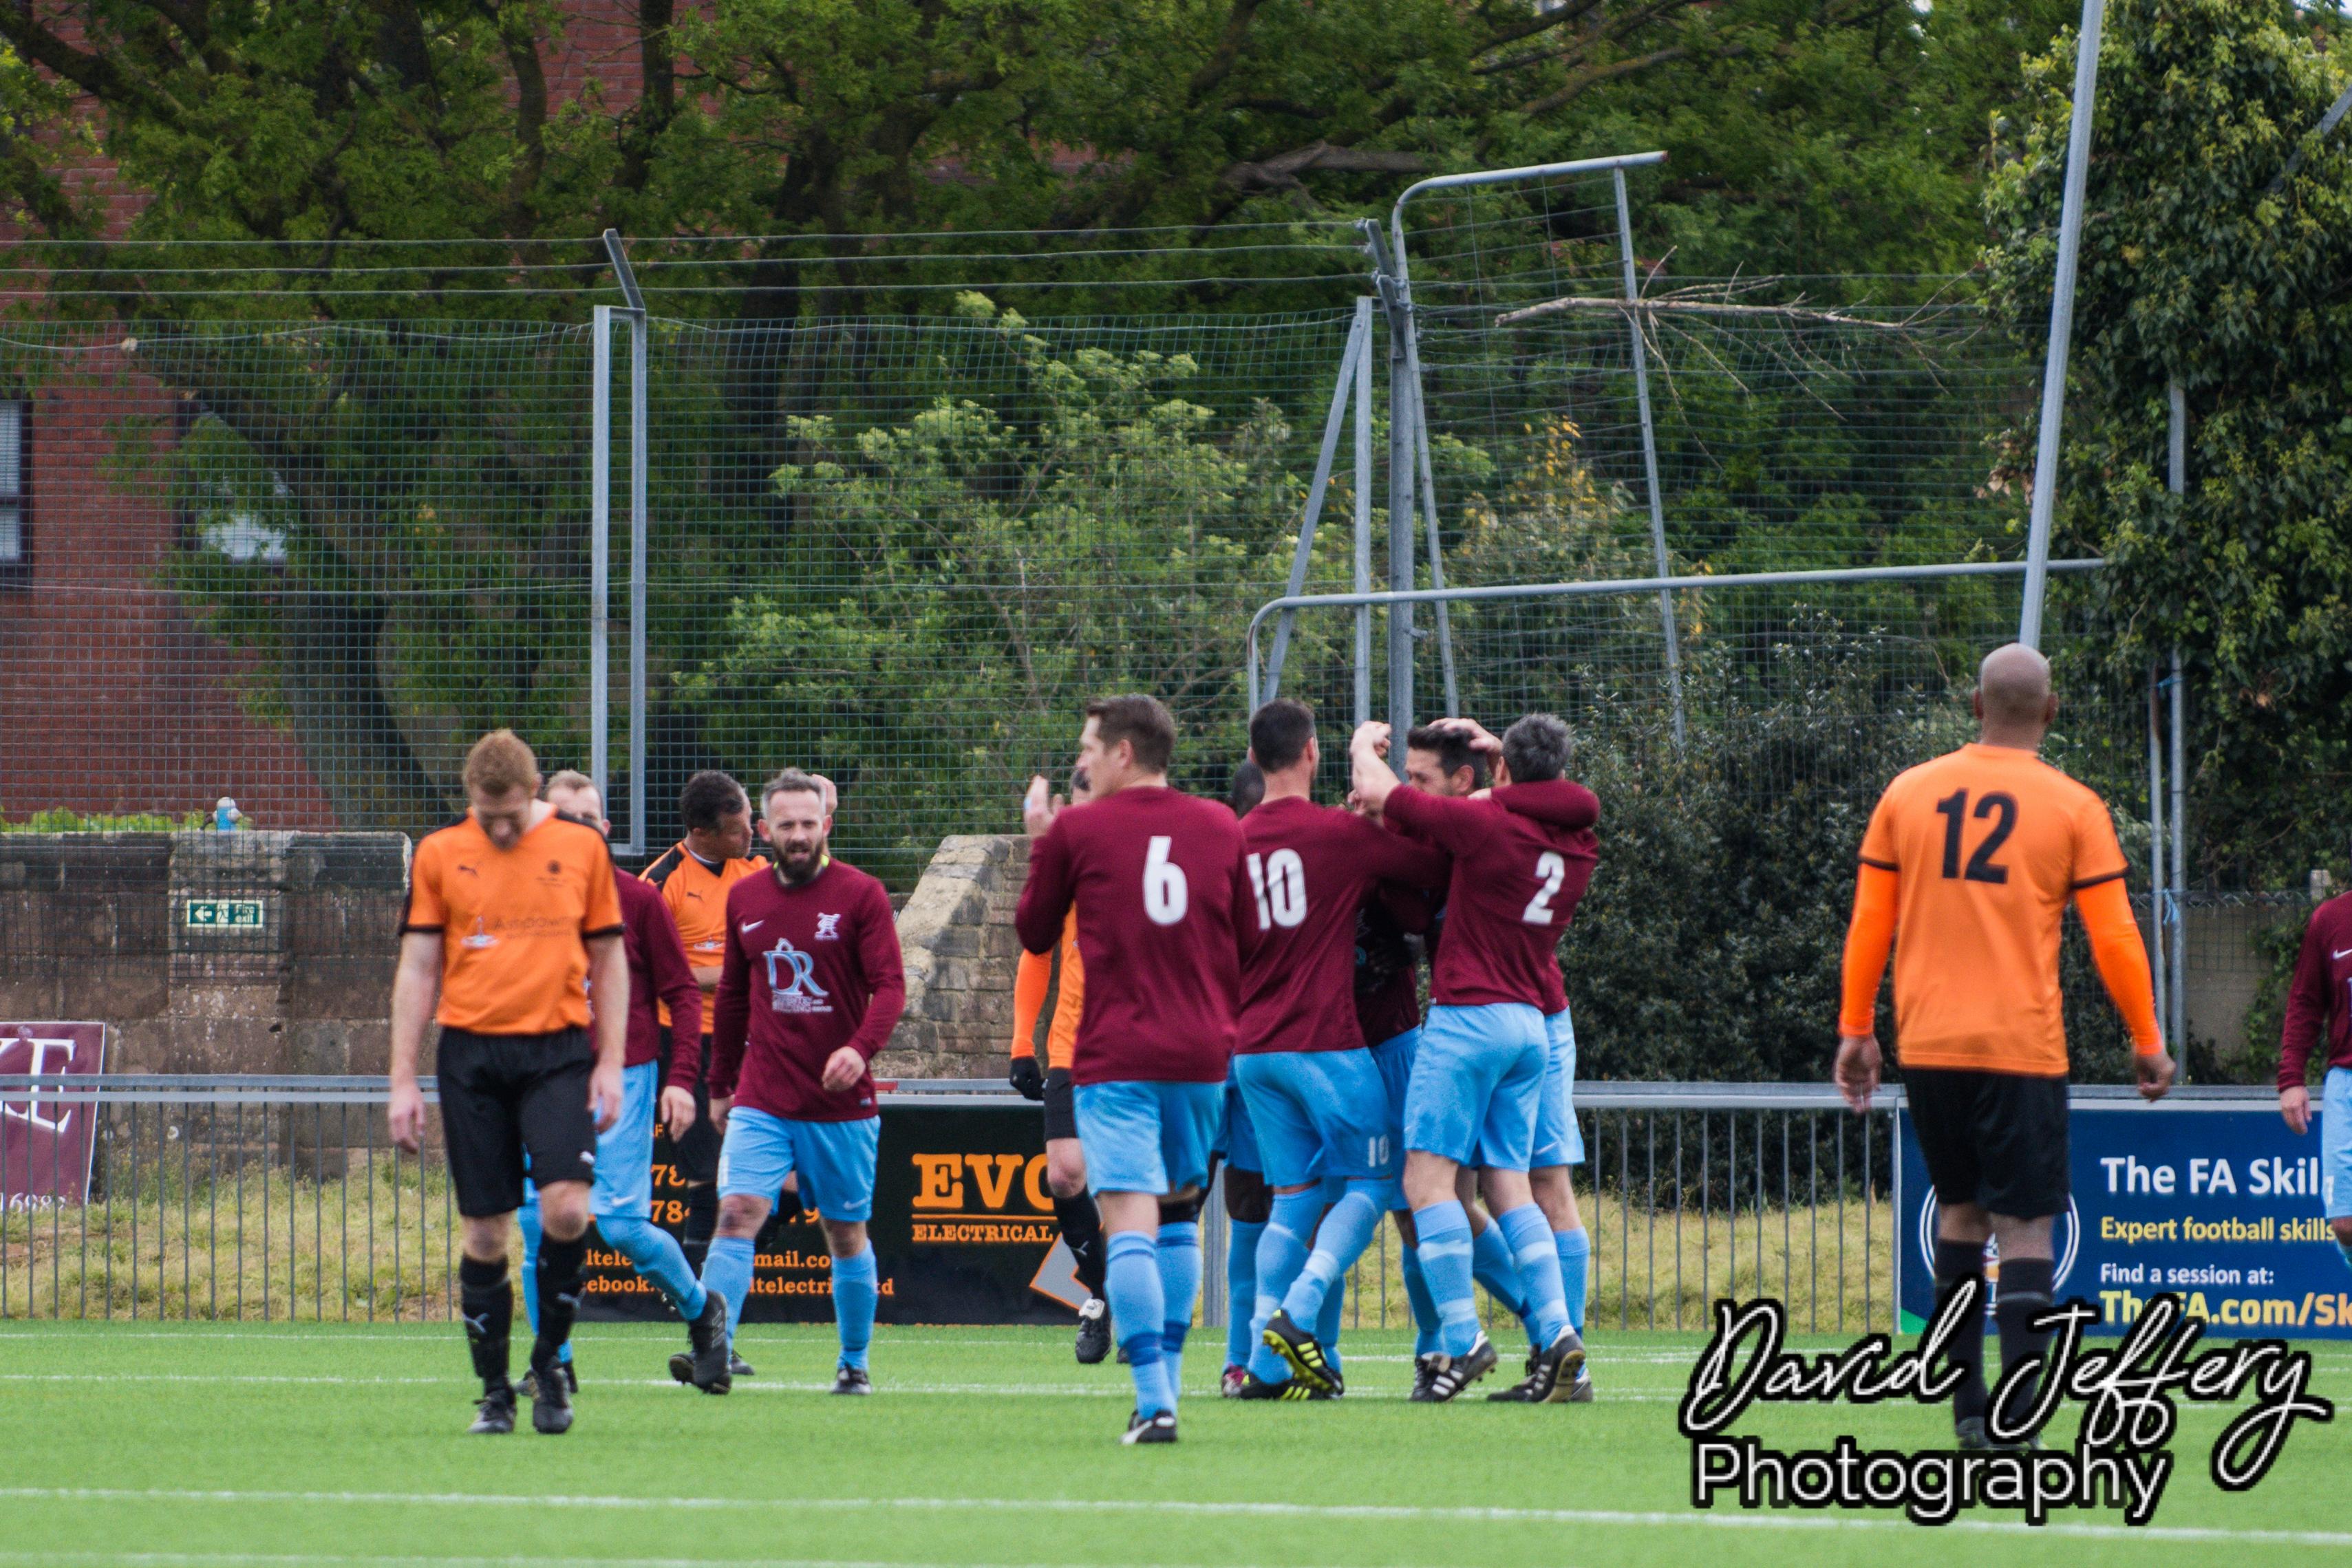 044 MOFC Vets vs Horl Vets 05.05